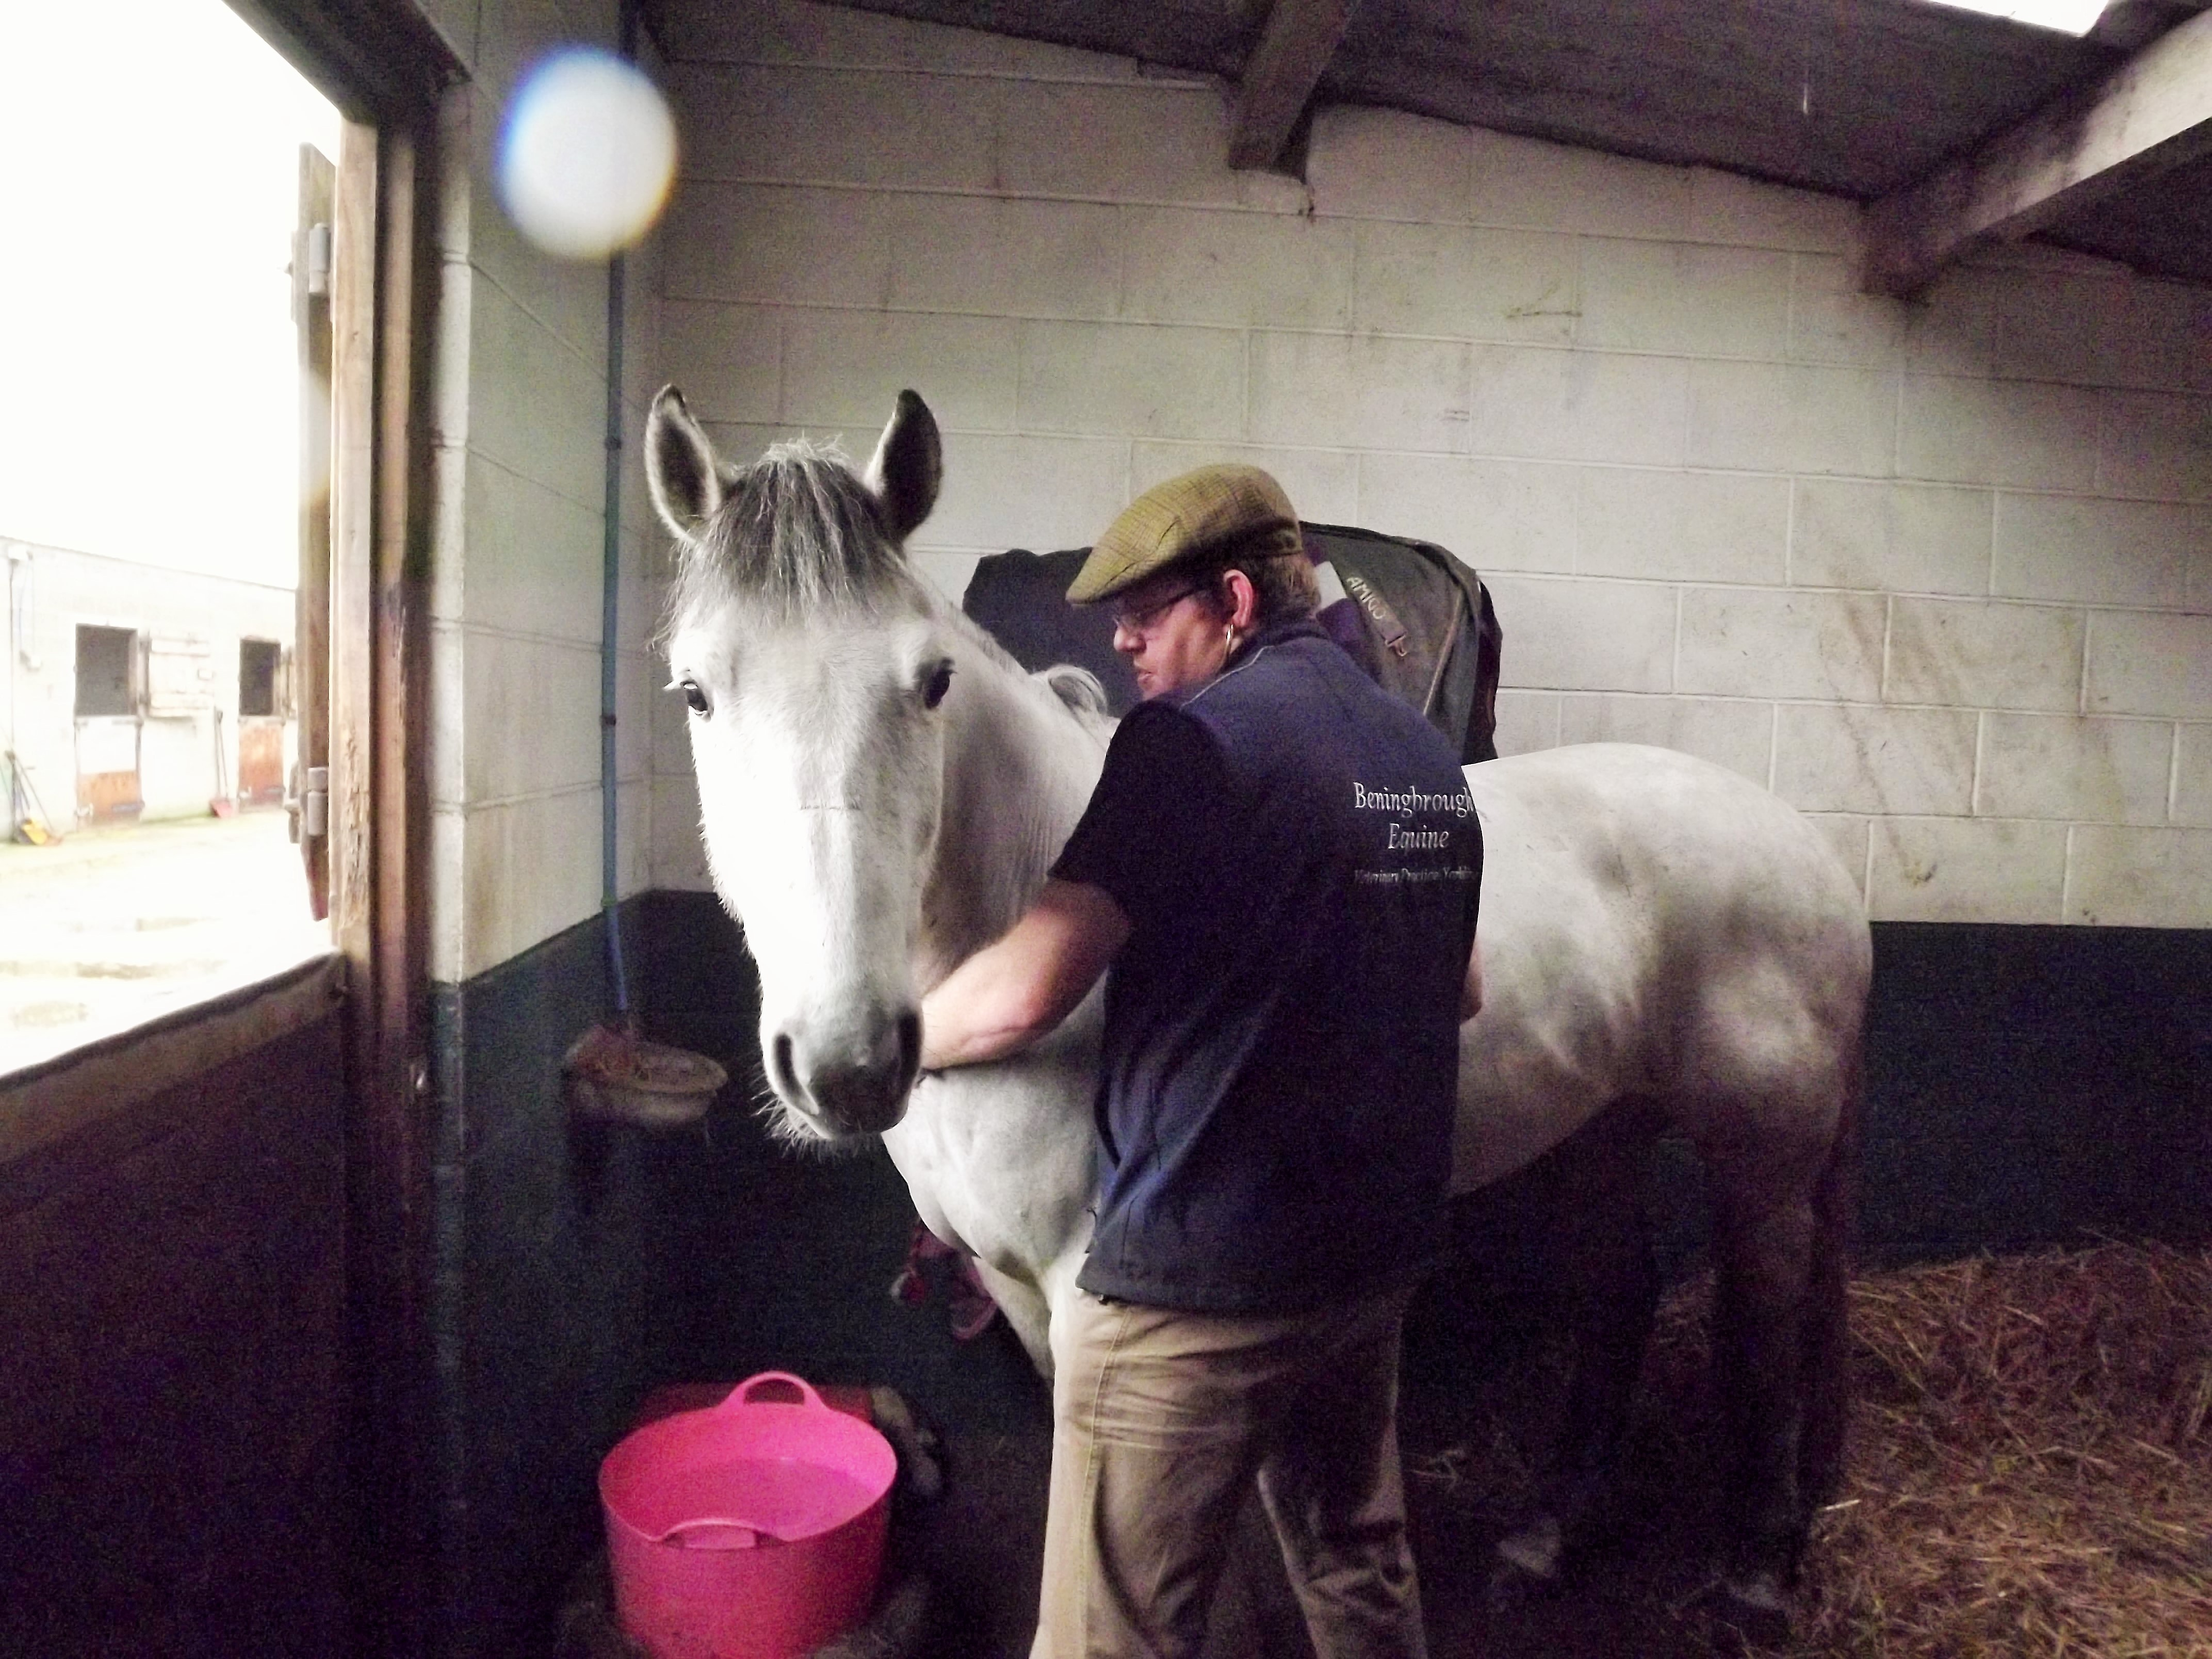 Beningbrough Equine Veterinary Surgery